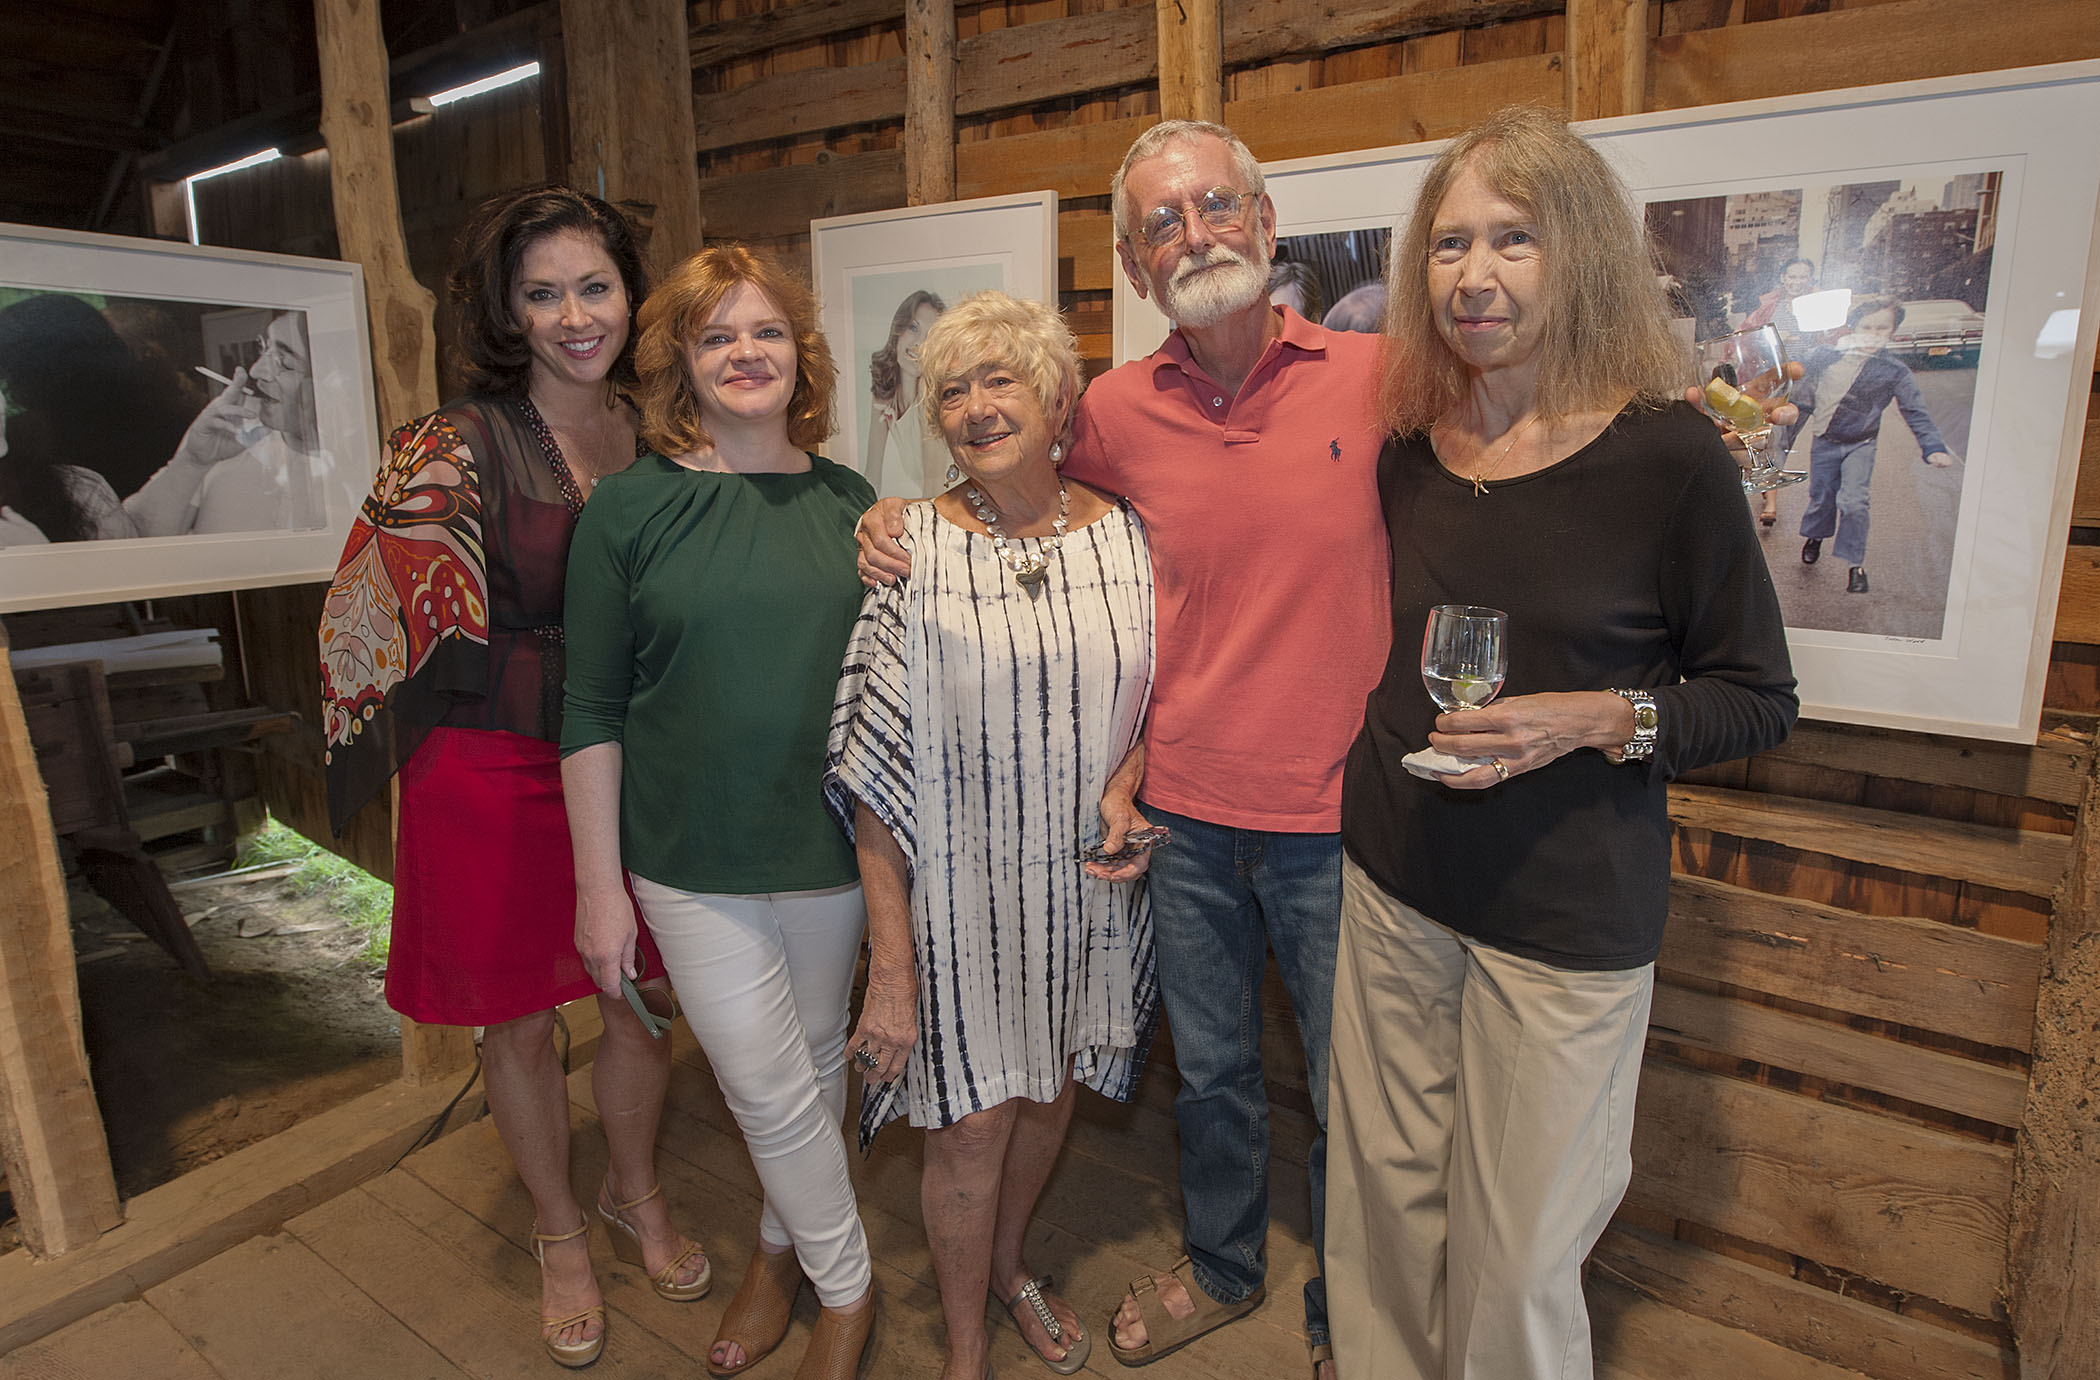 Lynn Stefanelli, curator Deidre Brennan, Susan Wood, Richard Barons (Director of the East Hampton Historical Society) and Roseanne Barons (credit: michael heller)